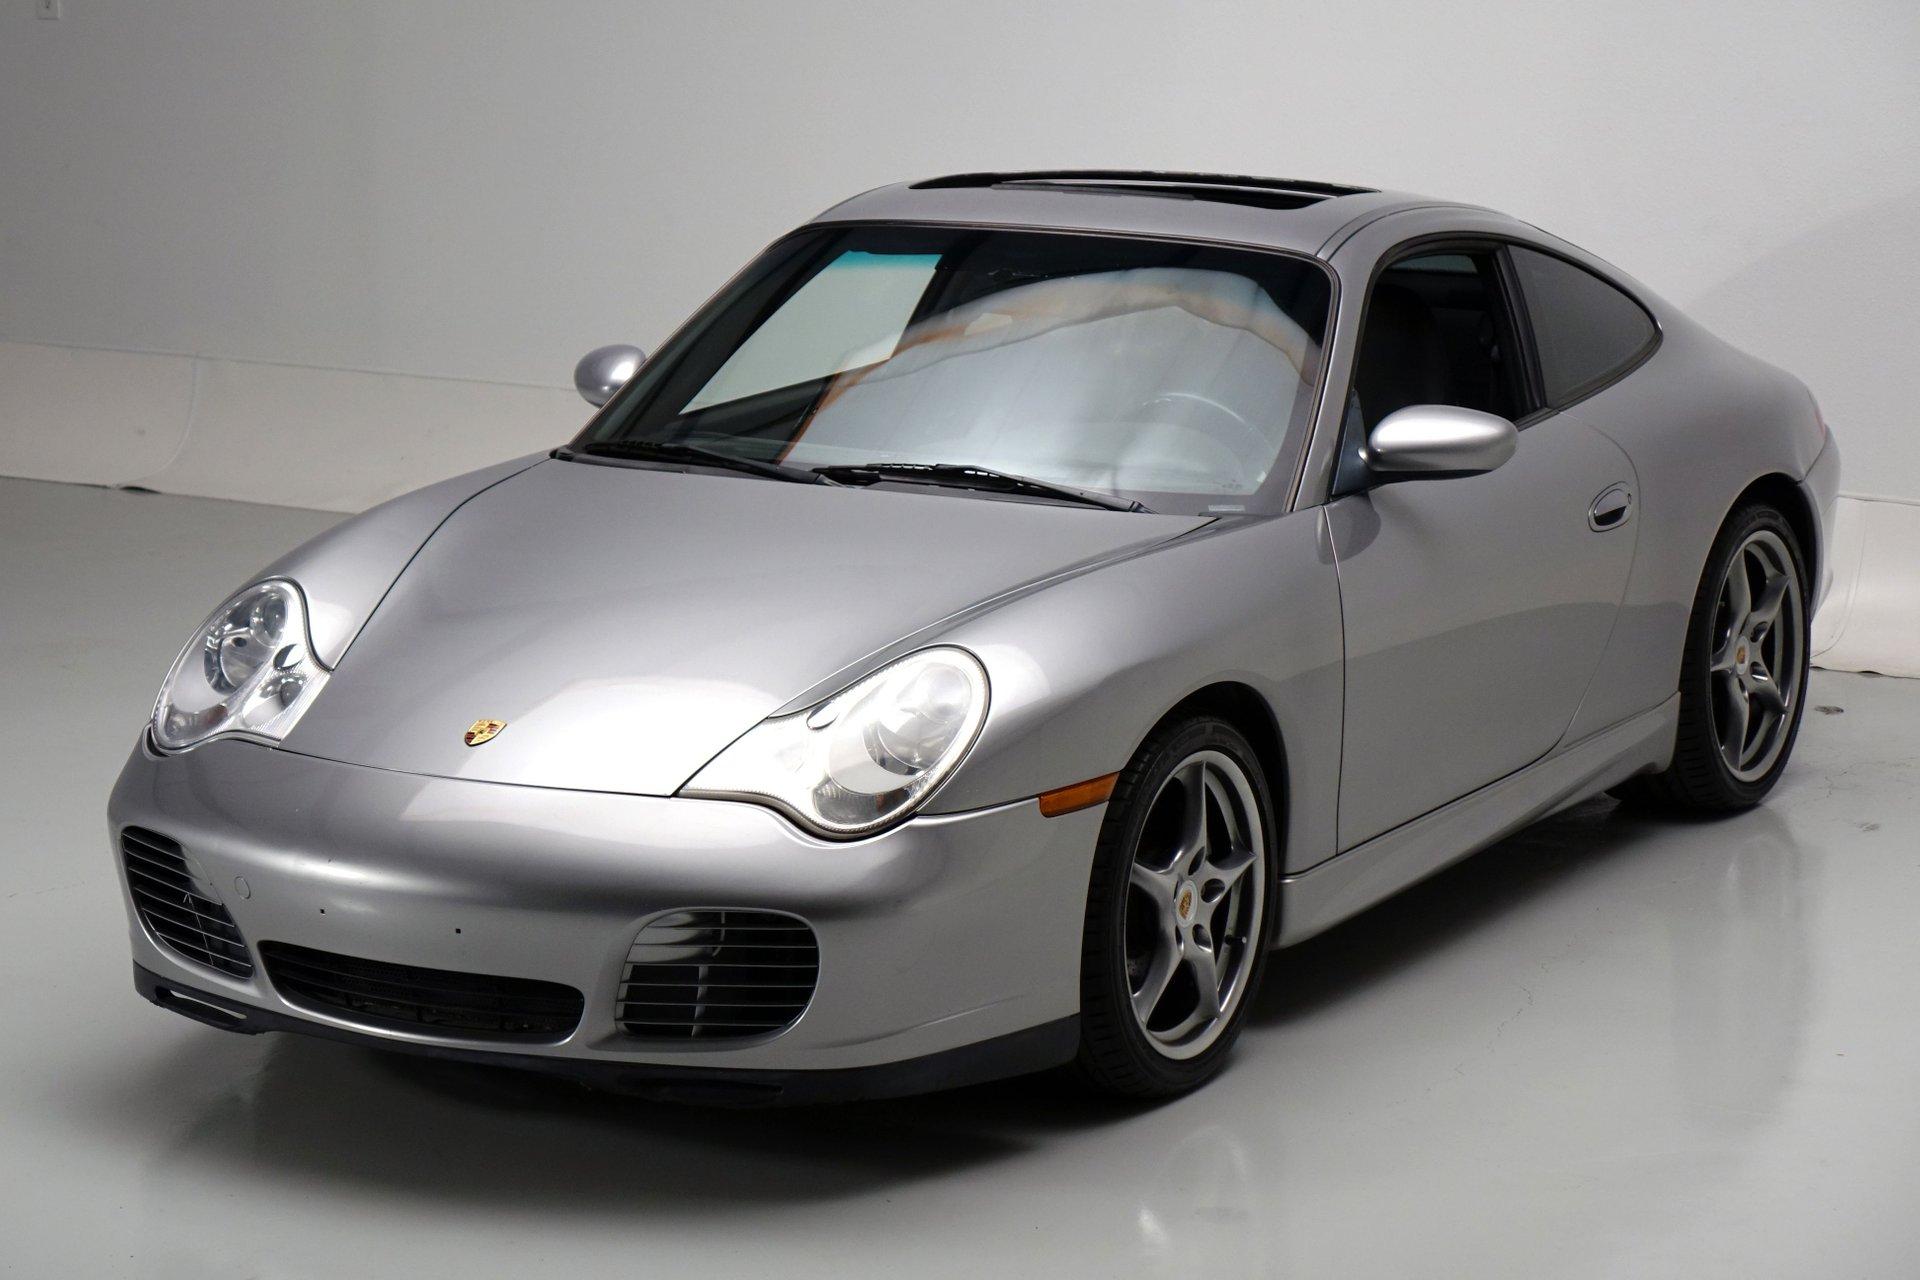 2004 porsche 911 2dr cpe carrera 6 spd manual